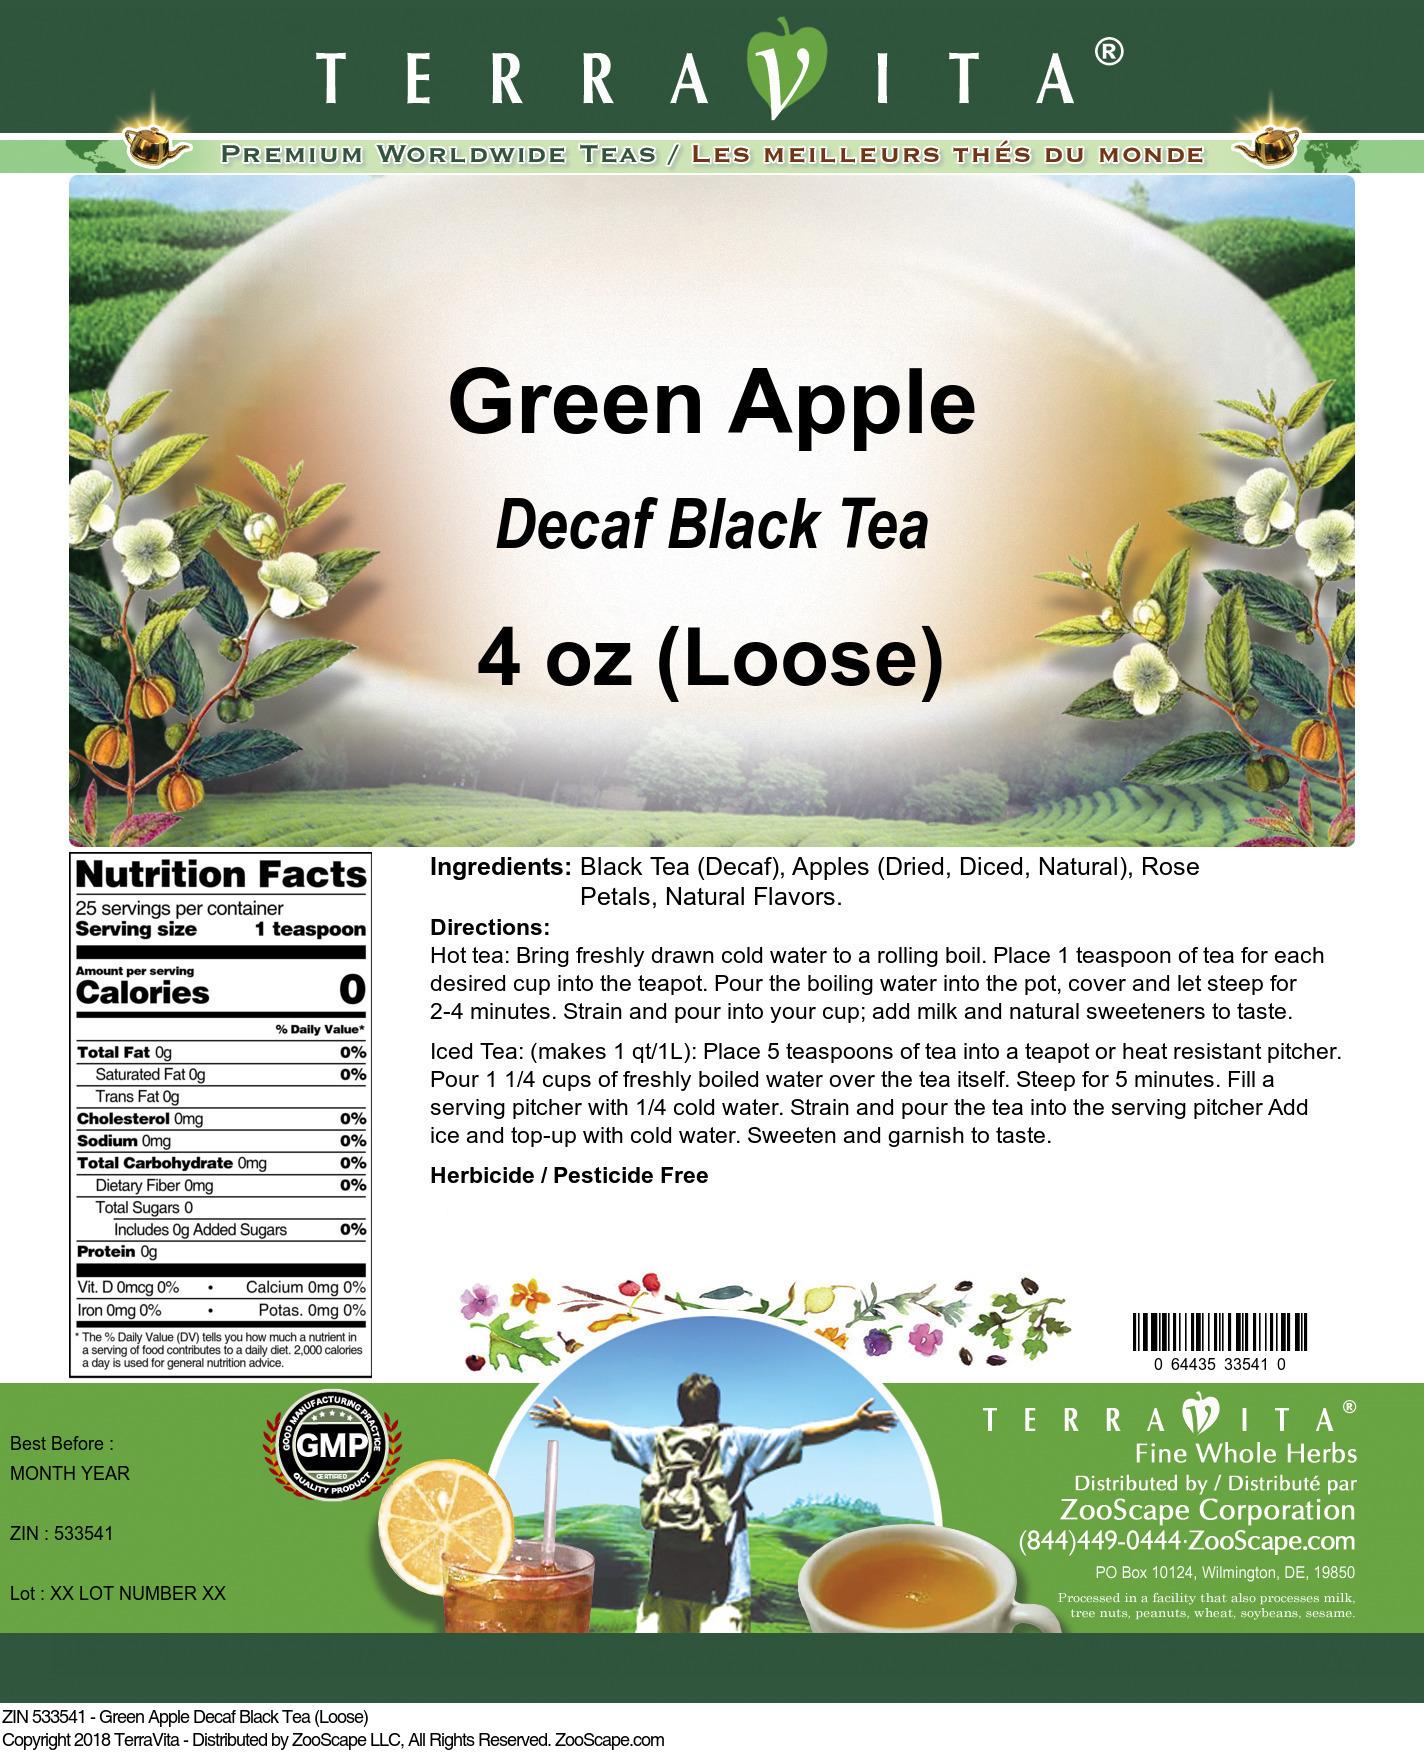 Green Apple Decaf Black Tea (Loose)